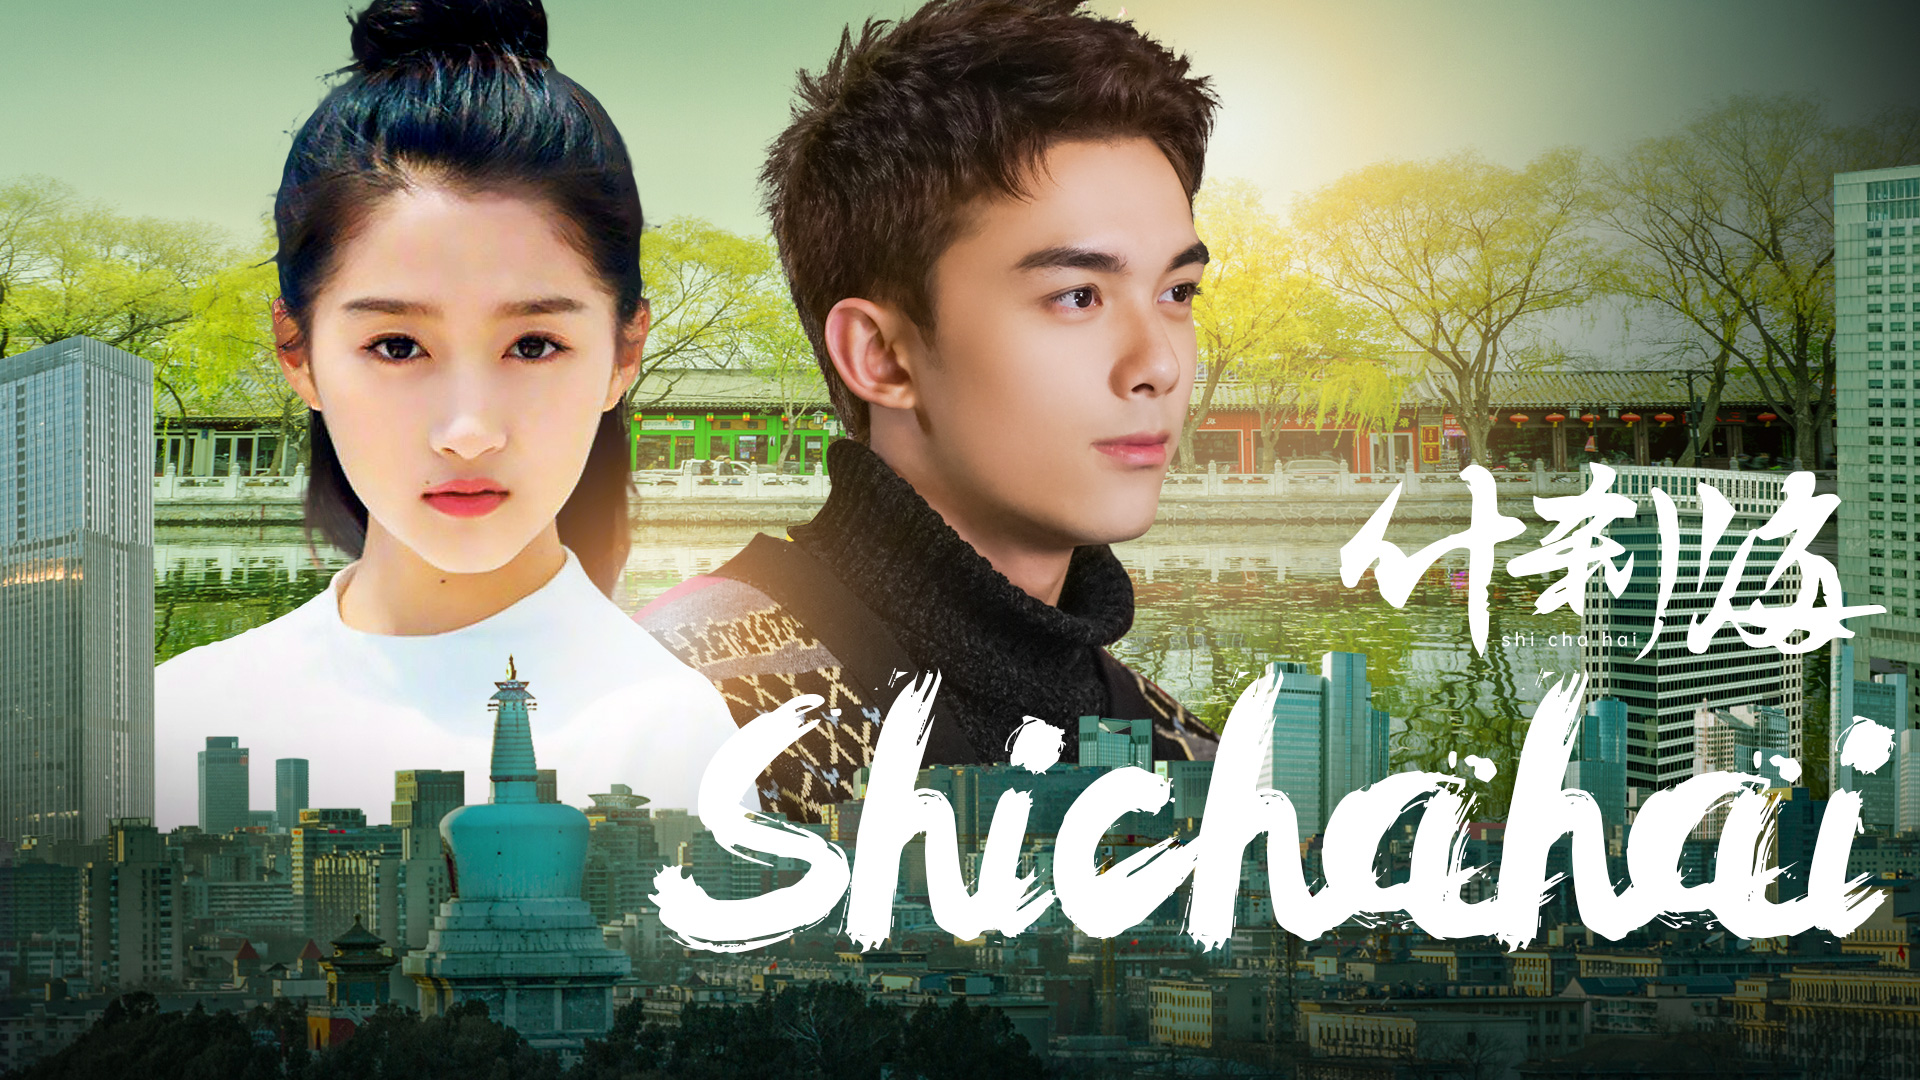 Shi Cha Hai